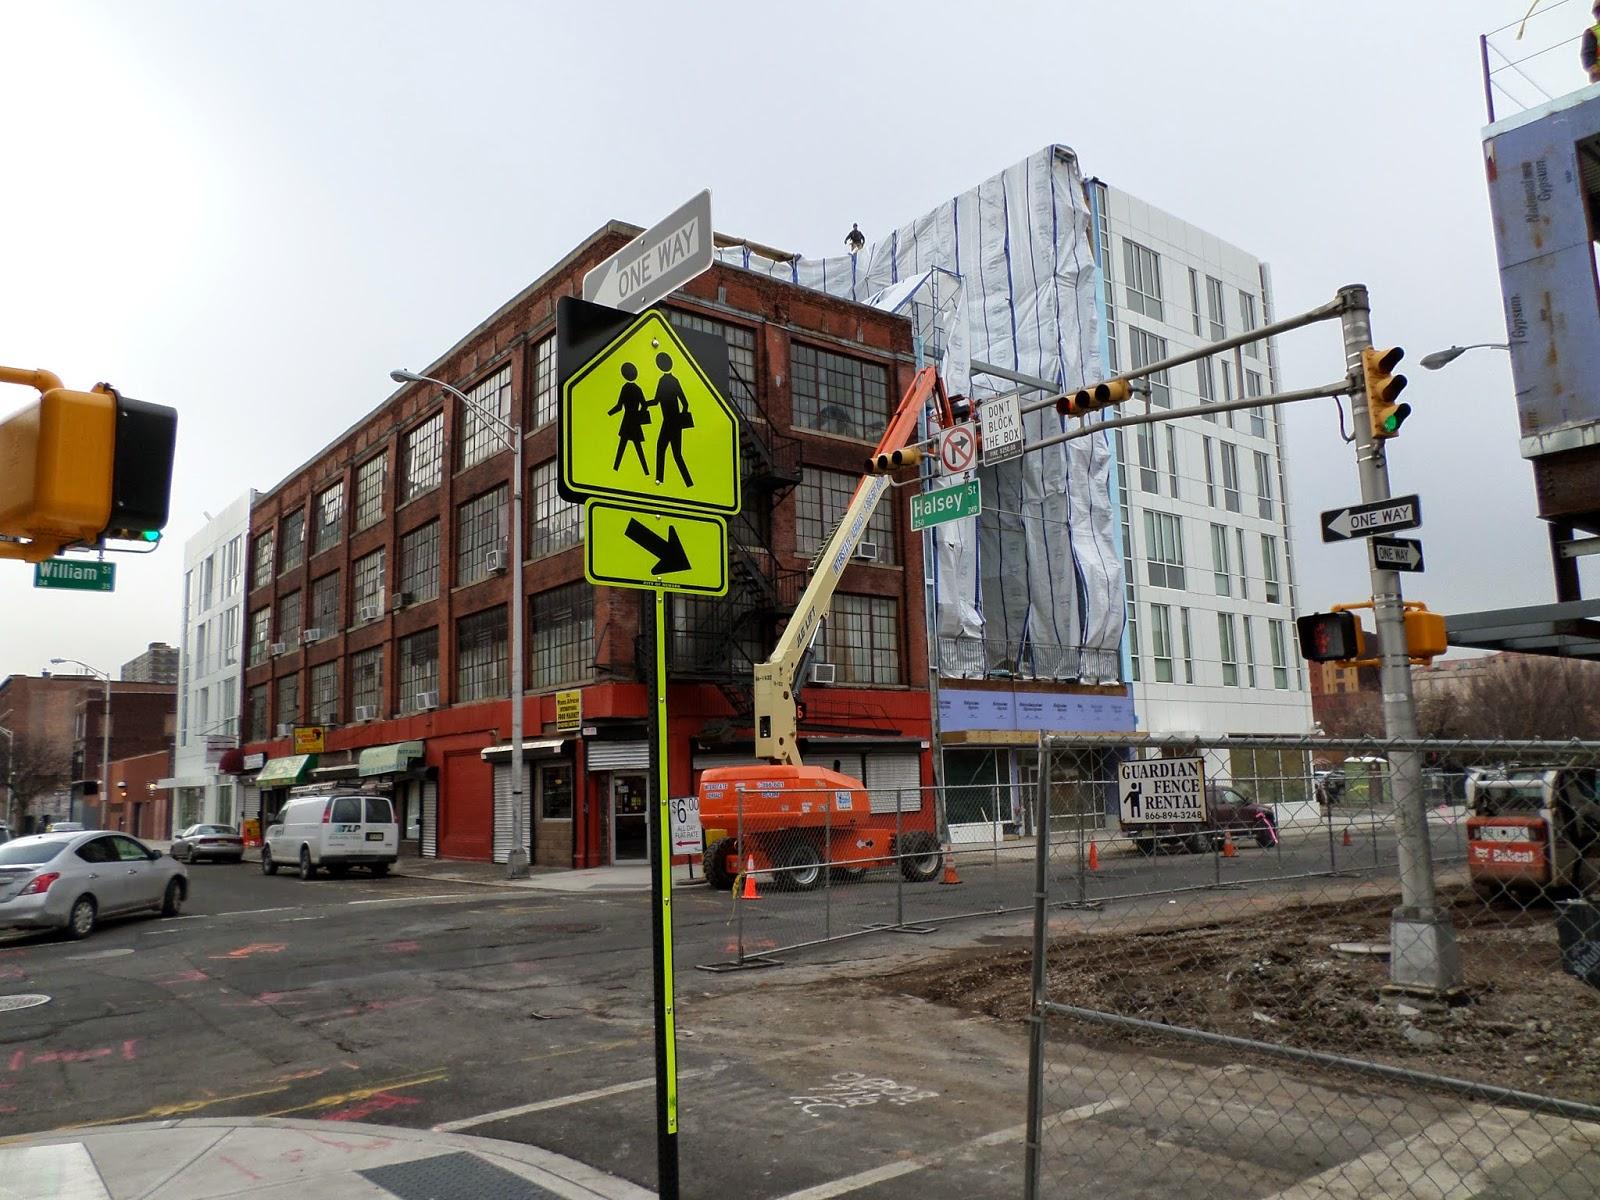 Newark, Jersey City, and New York 1 21 2015   Urbanism vs Modernism